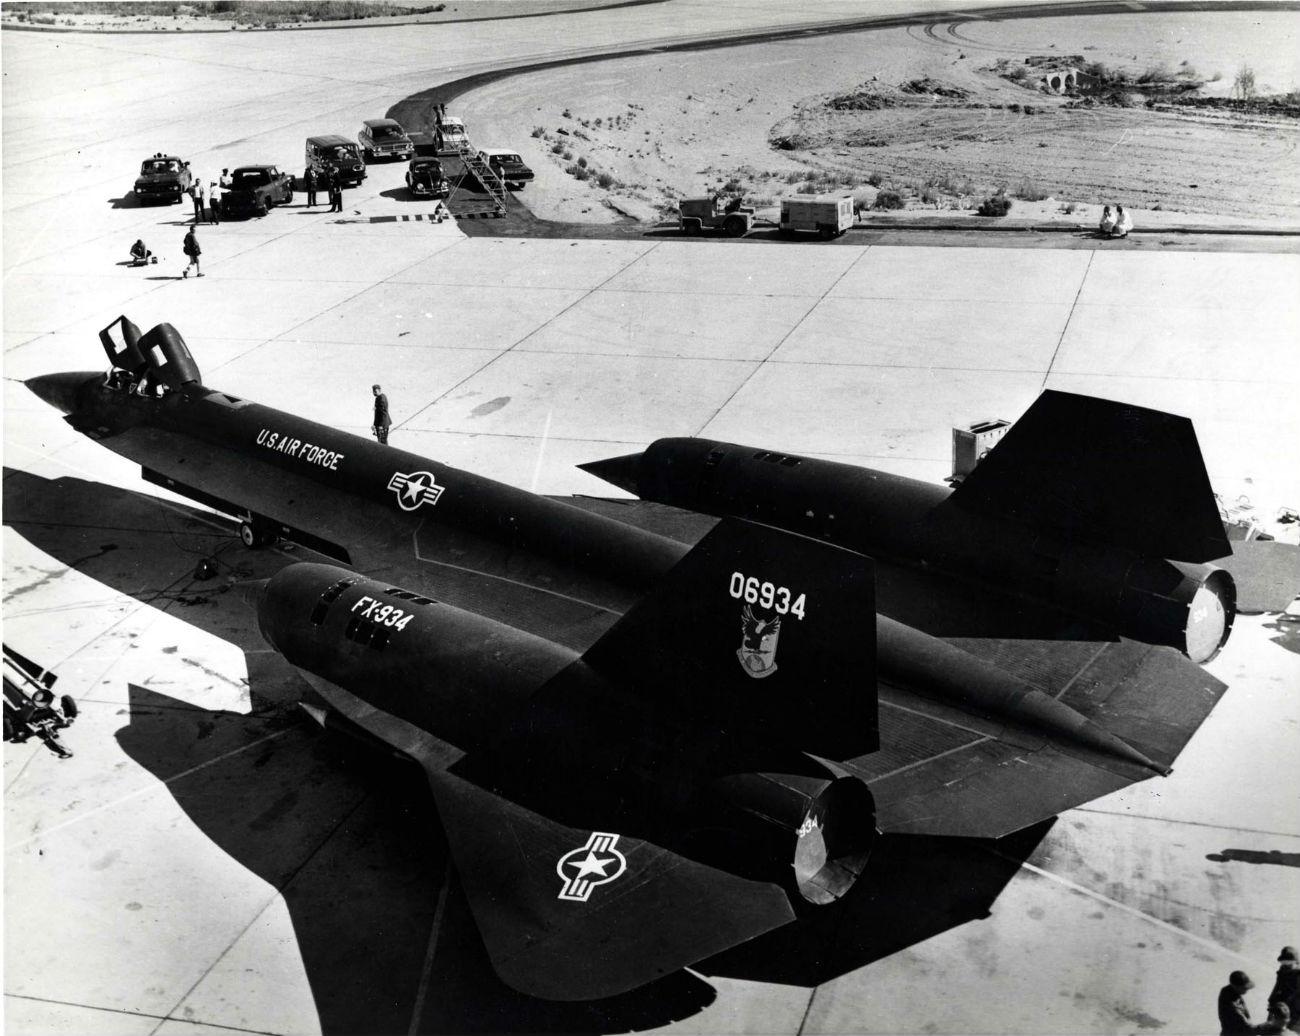 Lockheed YF-12 - On the ground